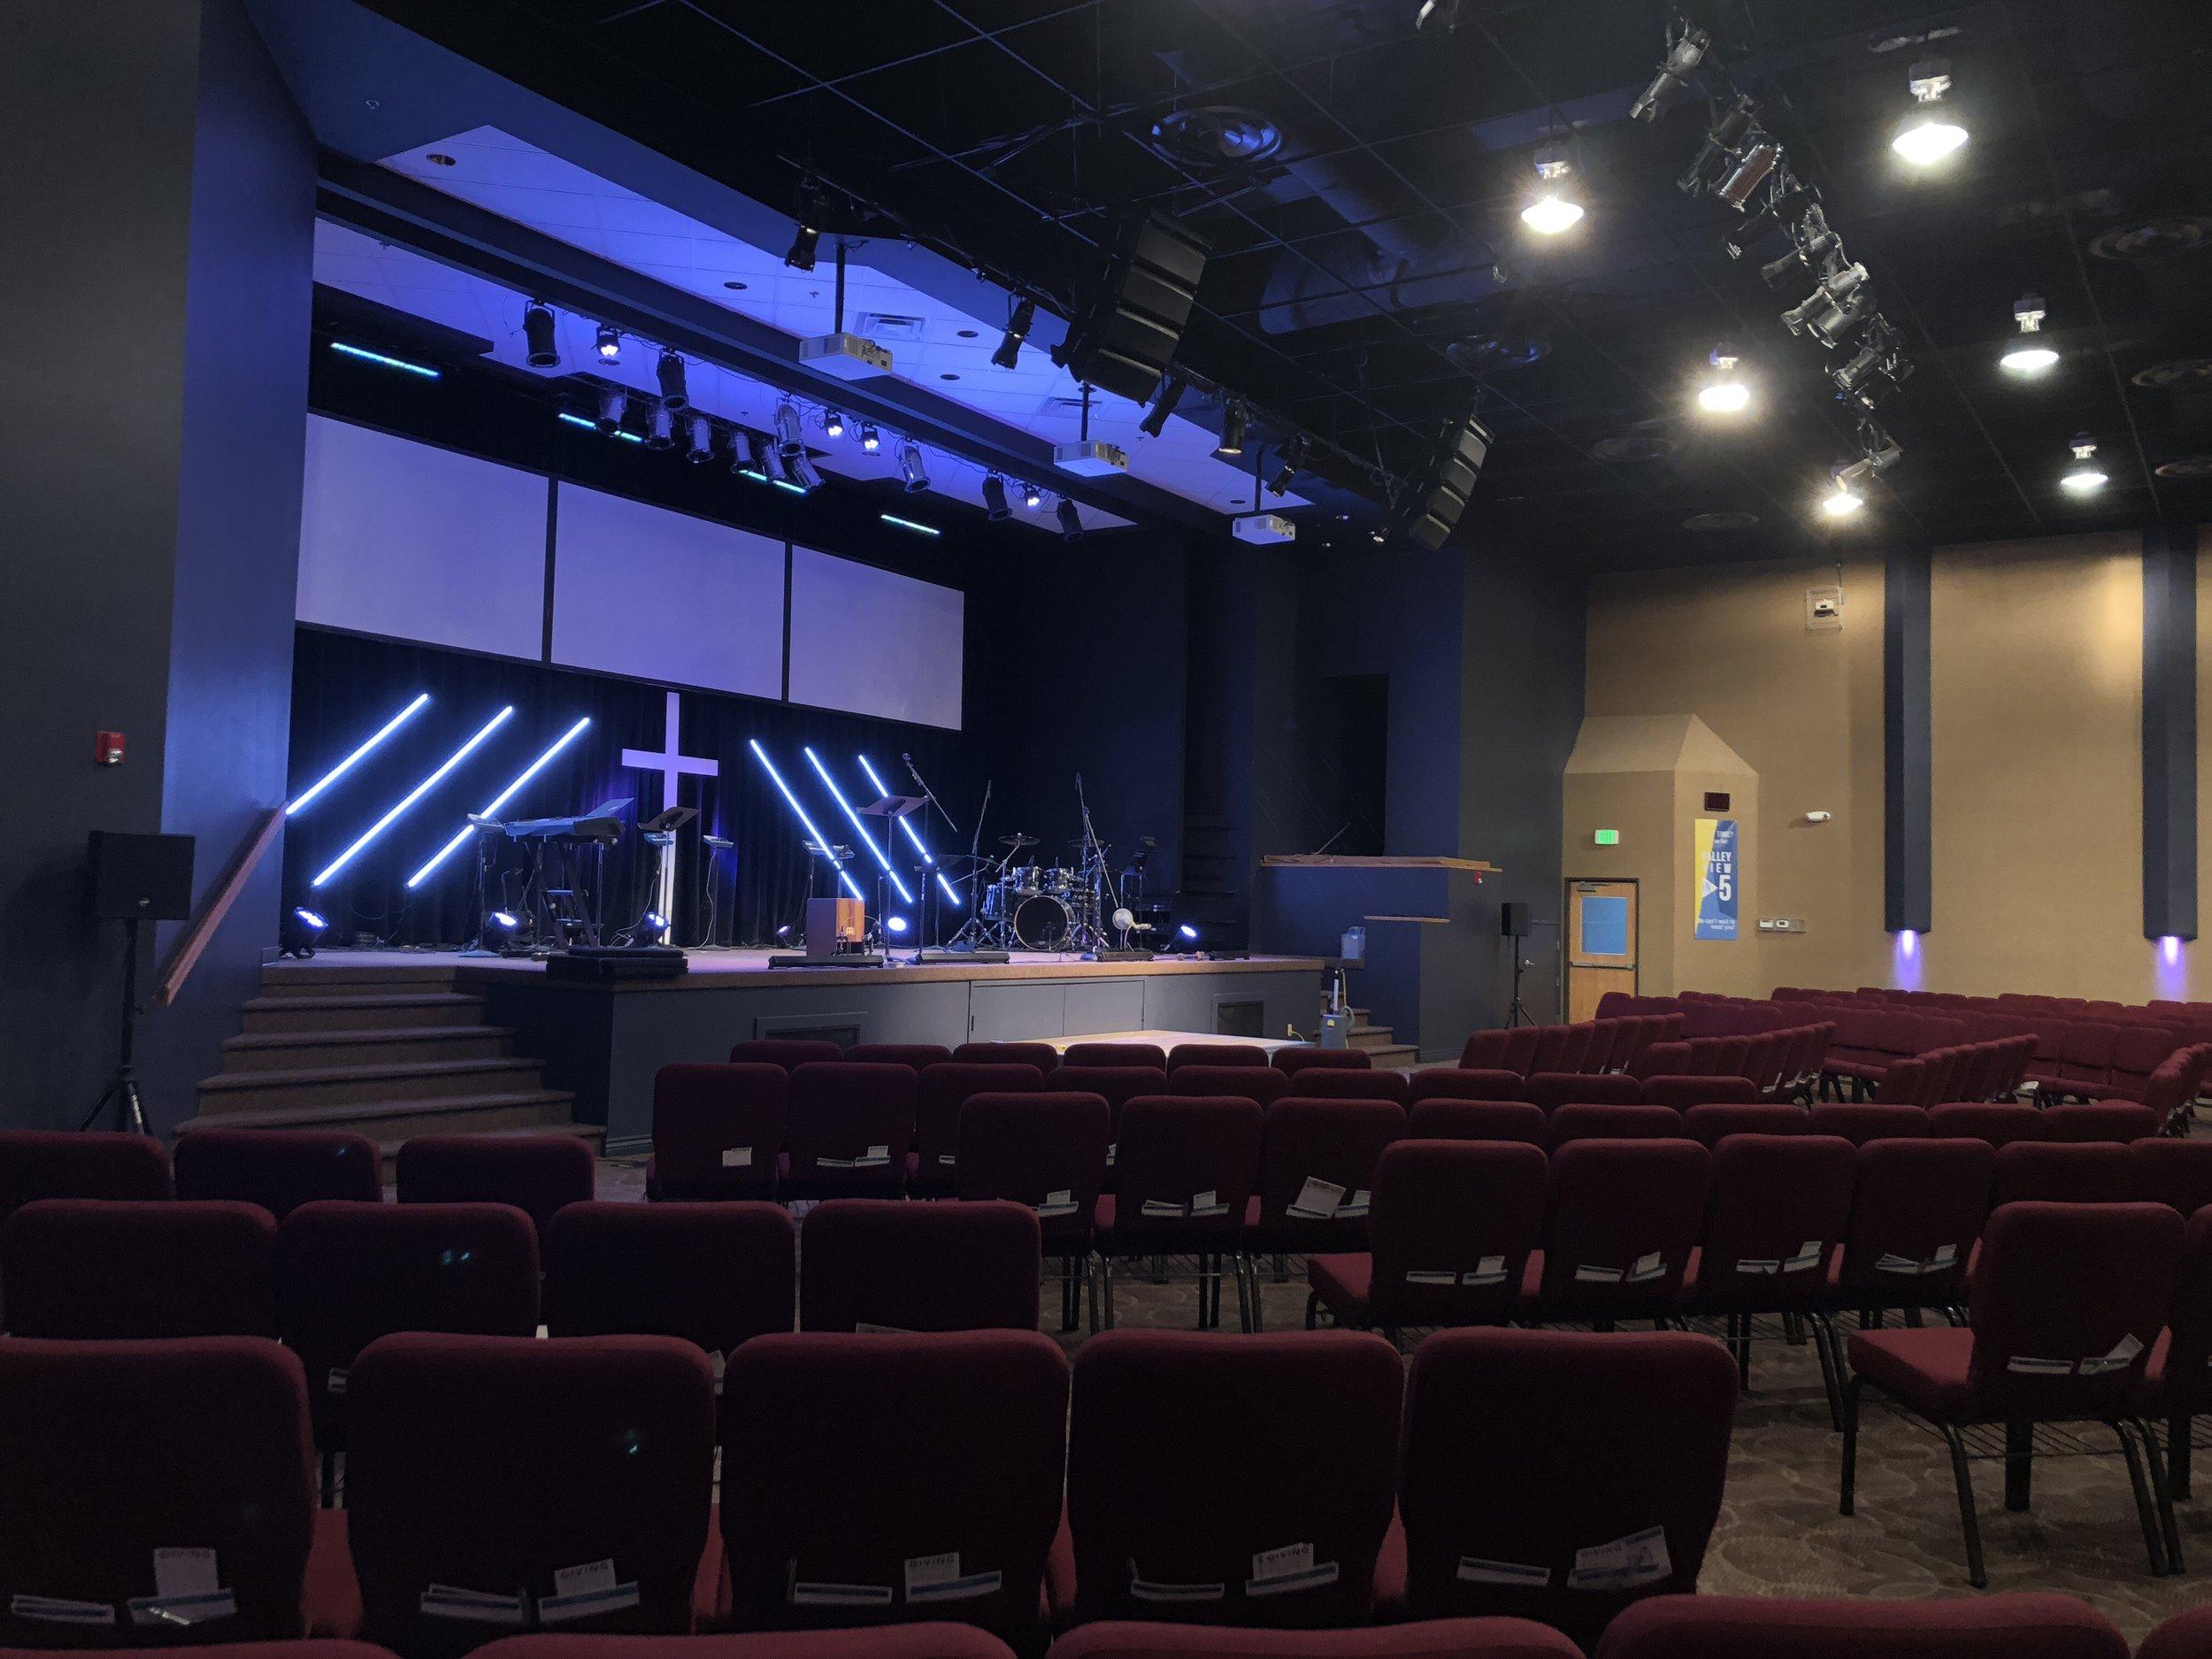 Valley View Church - Denver, CO